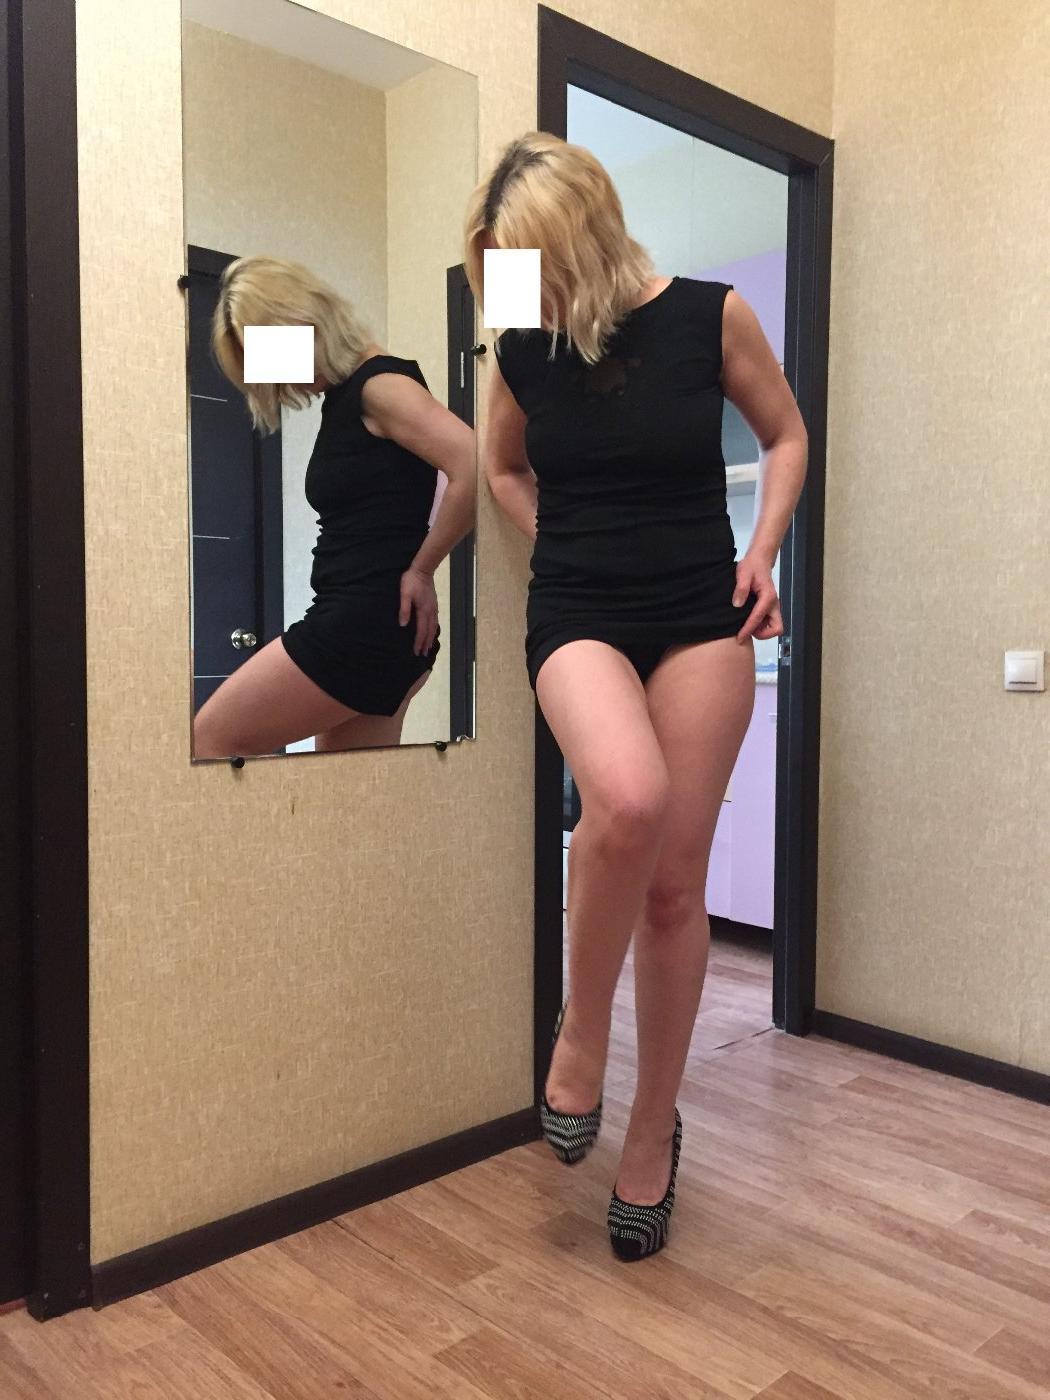 Индивидуалка Ирочка, 27 лет, метро Калужская